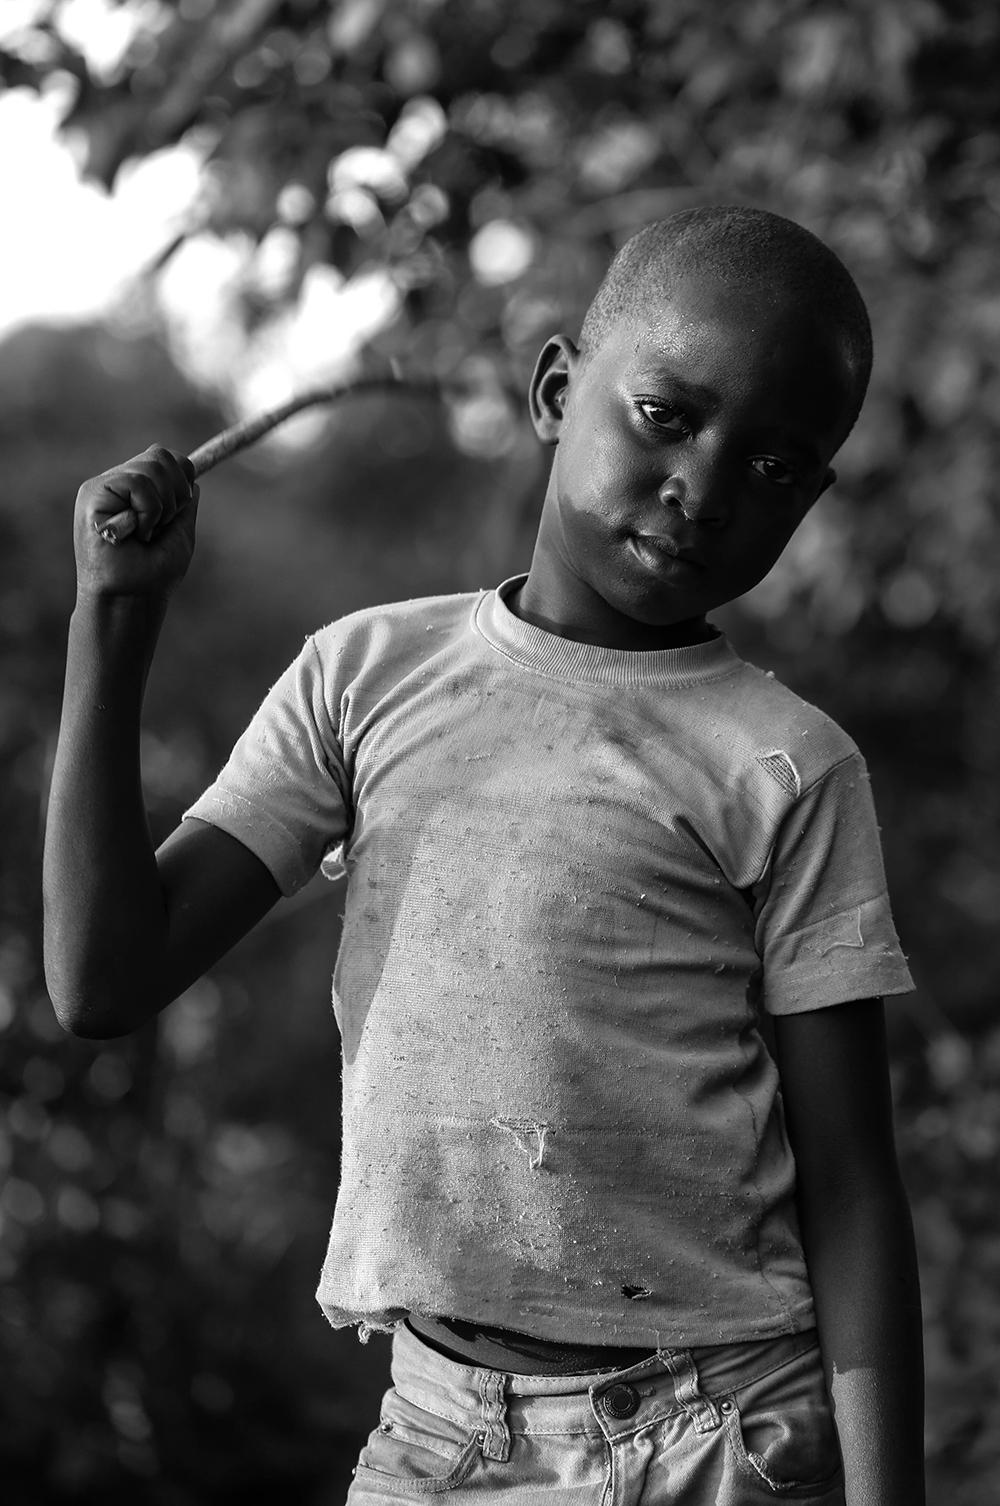 Kenya_2017_05_25_4971.jpg